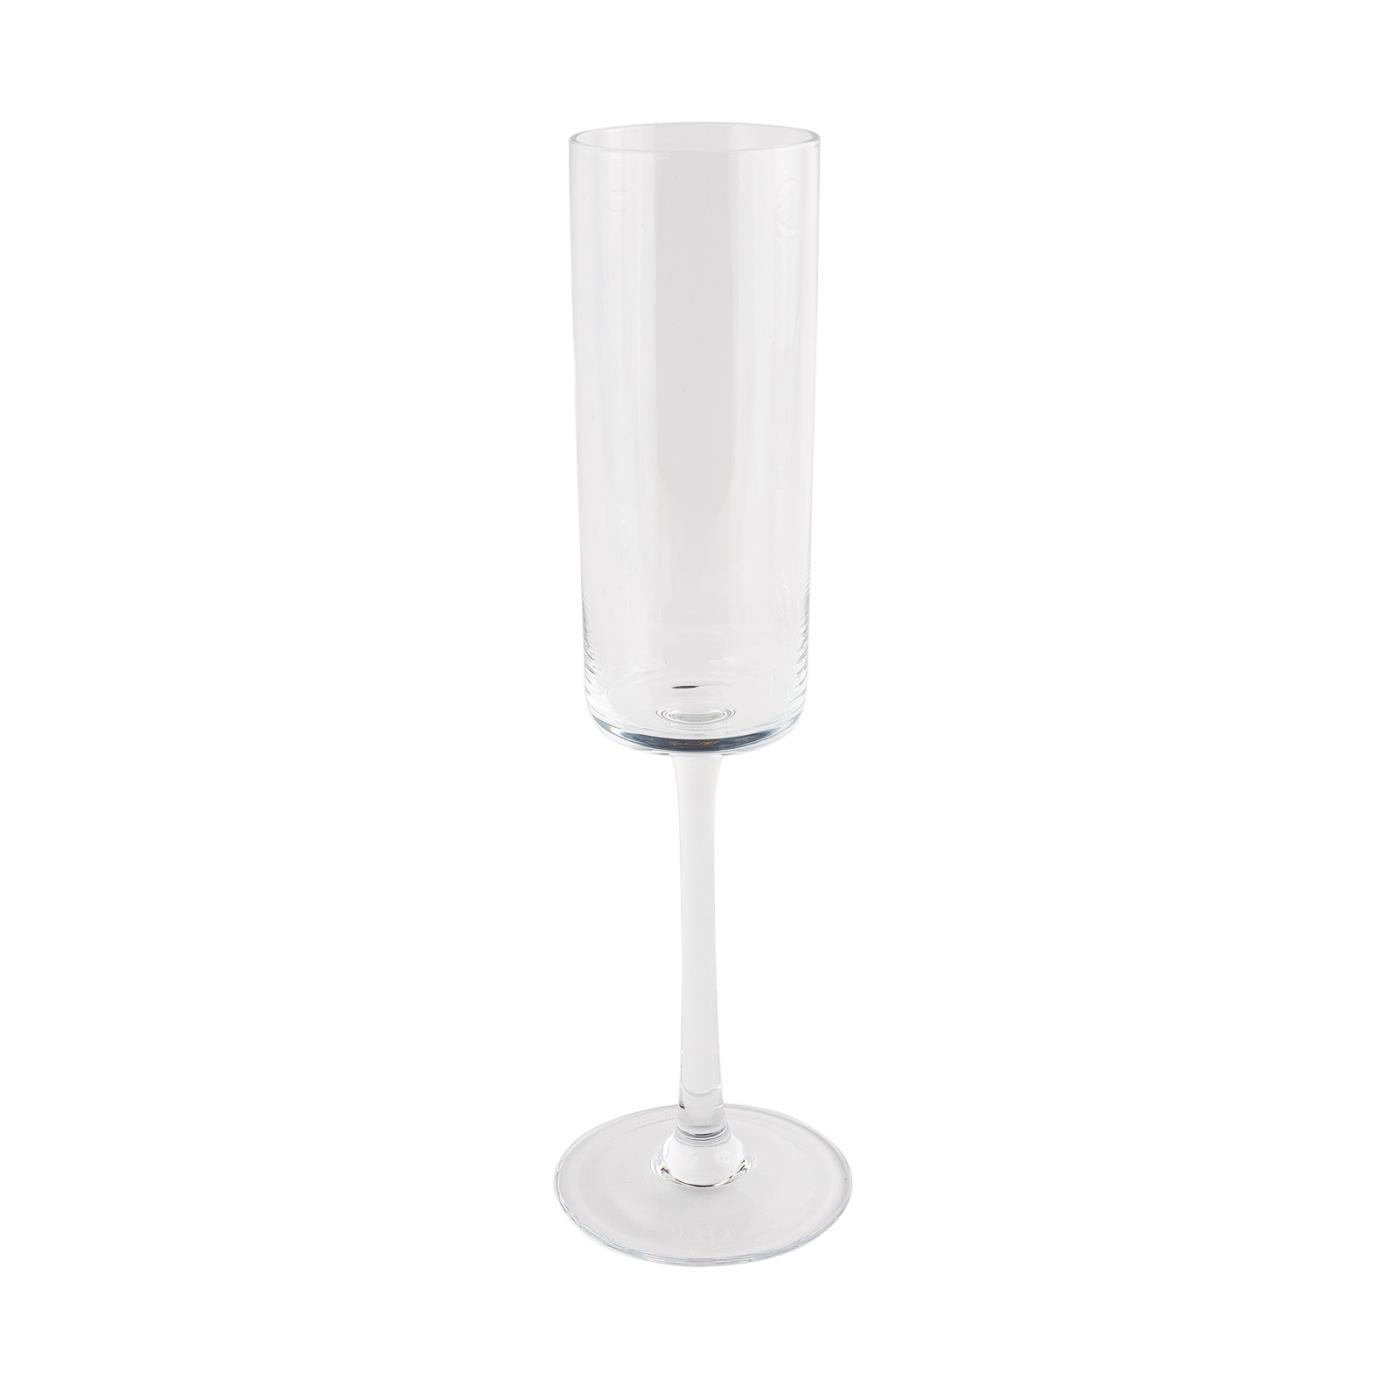 Mod - Champagne Flute 7 oz